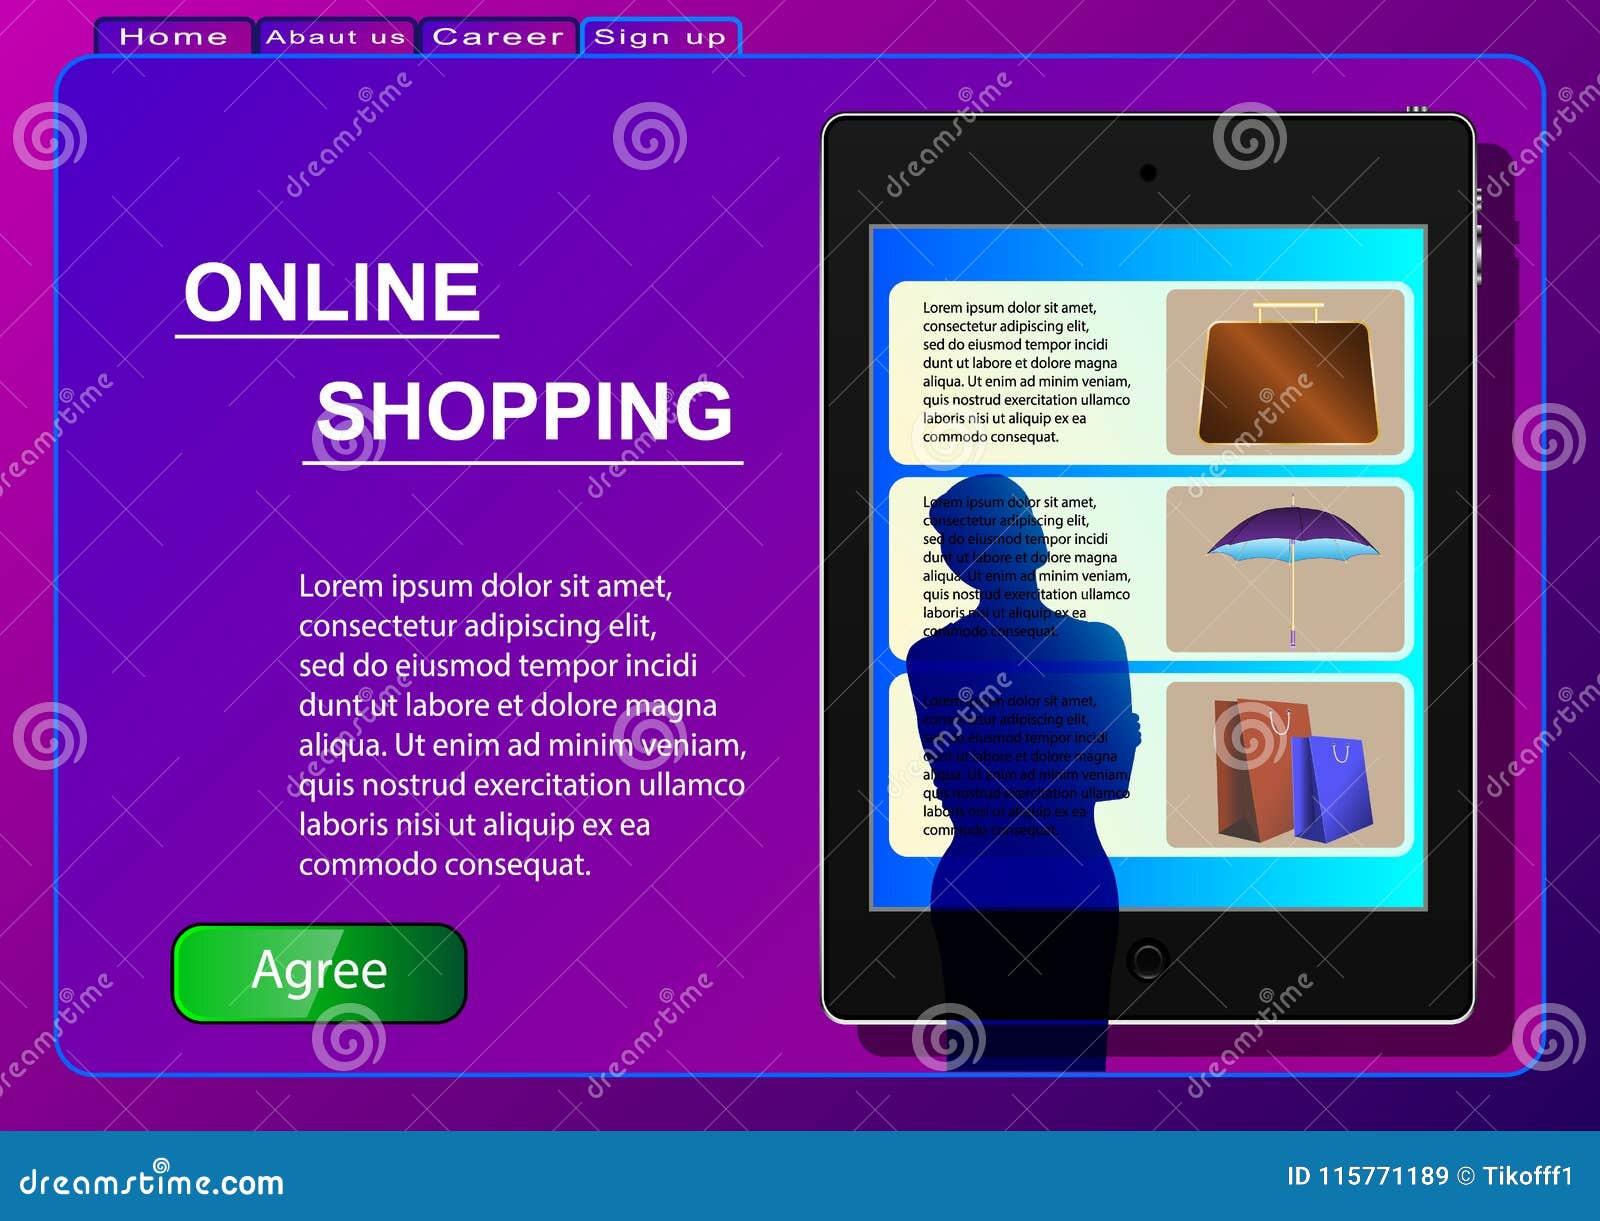 Dof καρτών αγορές χεριών εστίασης ρηχές on-line πολύ Πώληση, καταναλωτισμός και έννοια ανθρώπων Μια γυναίκα σε ένα σε απευθείας σ